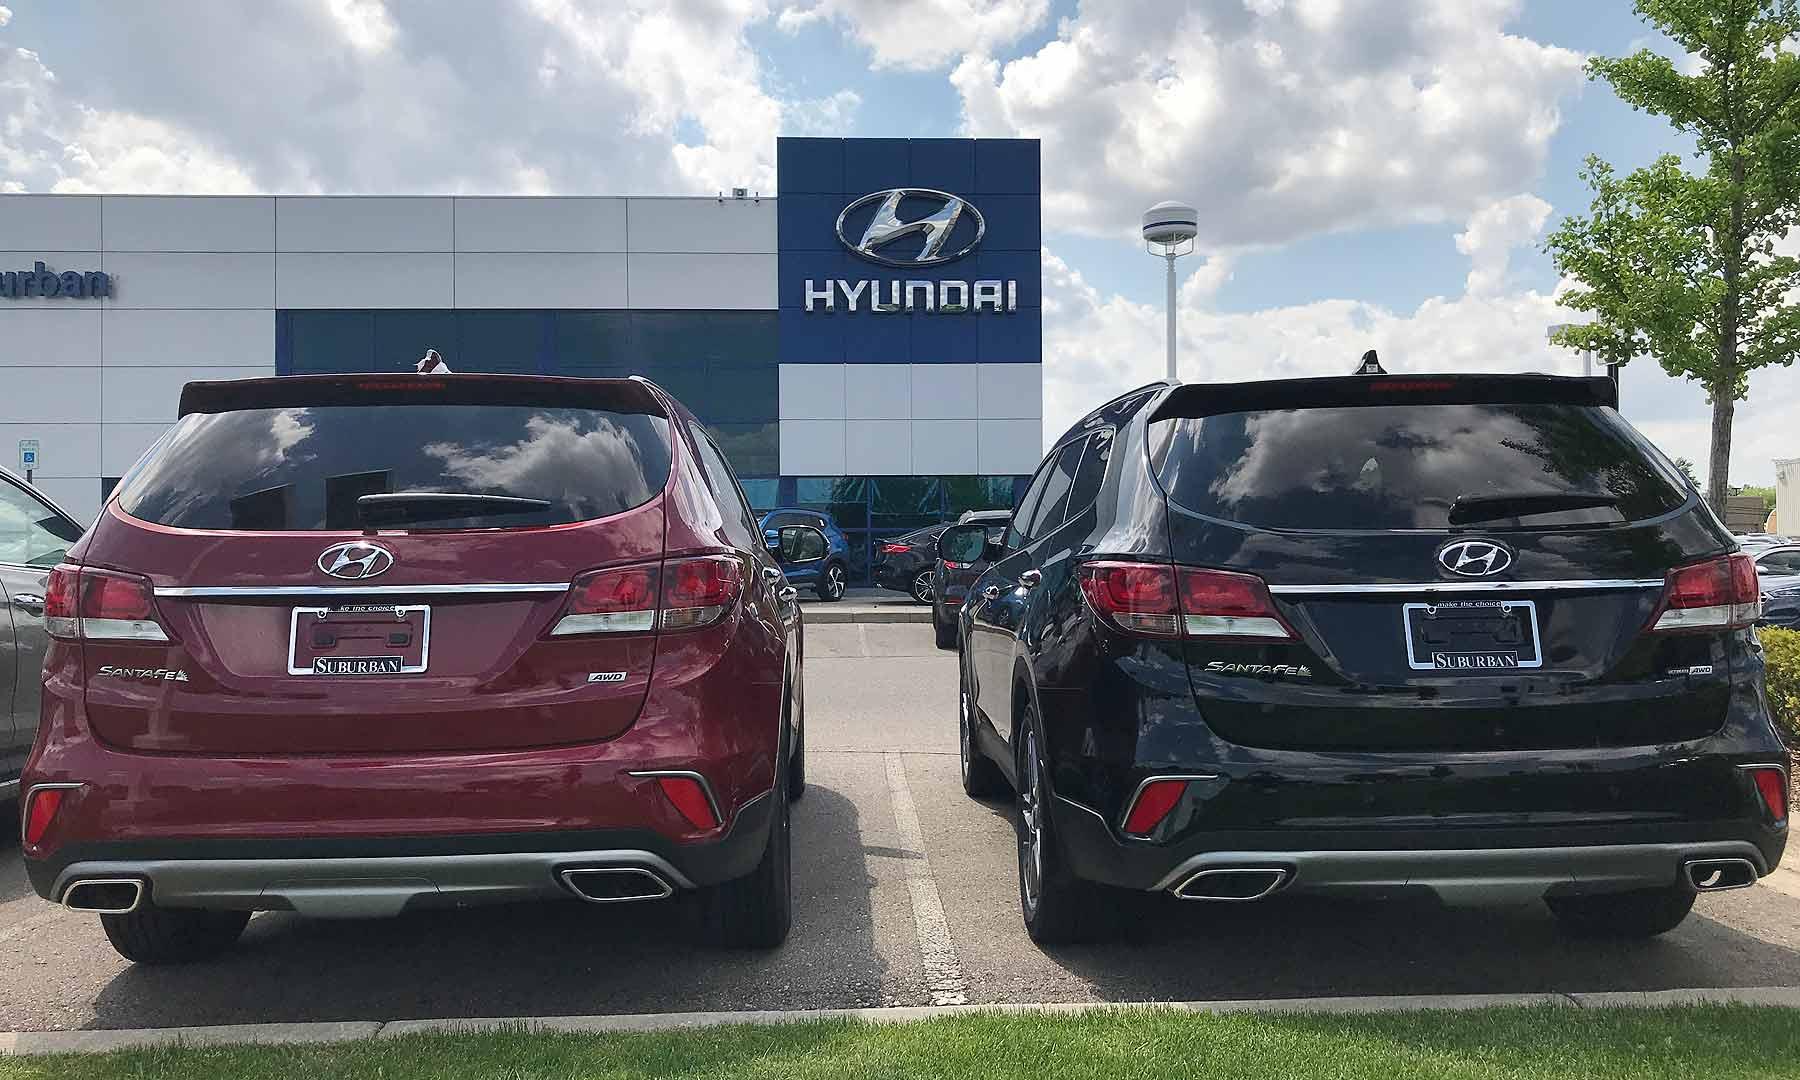 Dealers unfazed by Hyundai revolving door